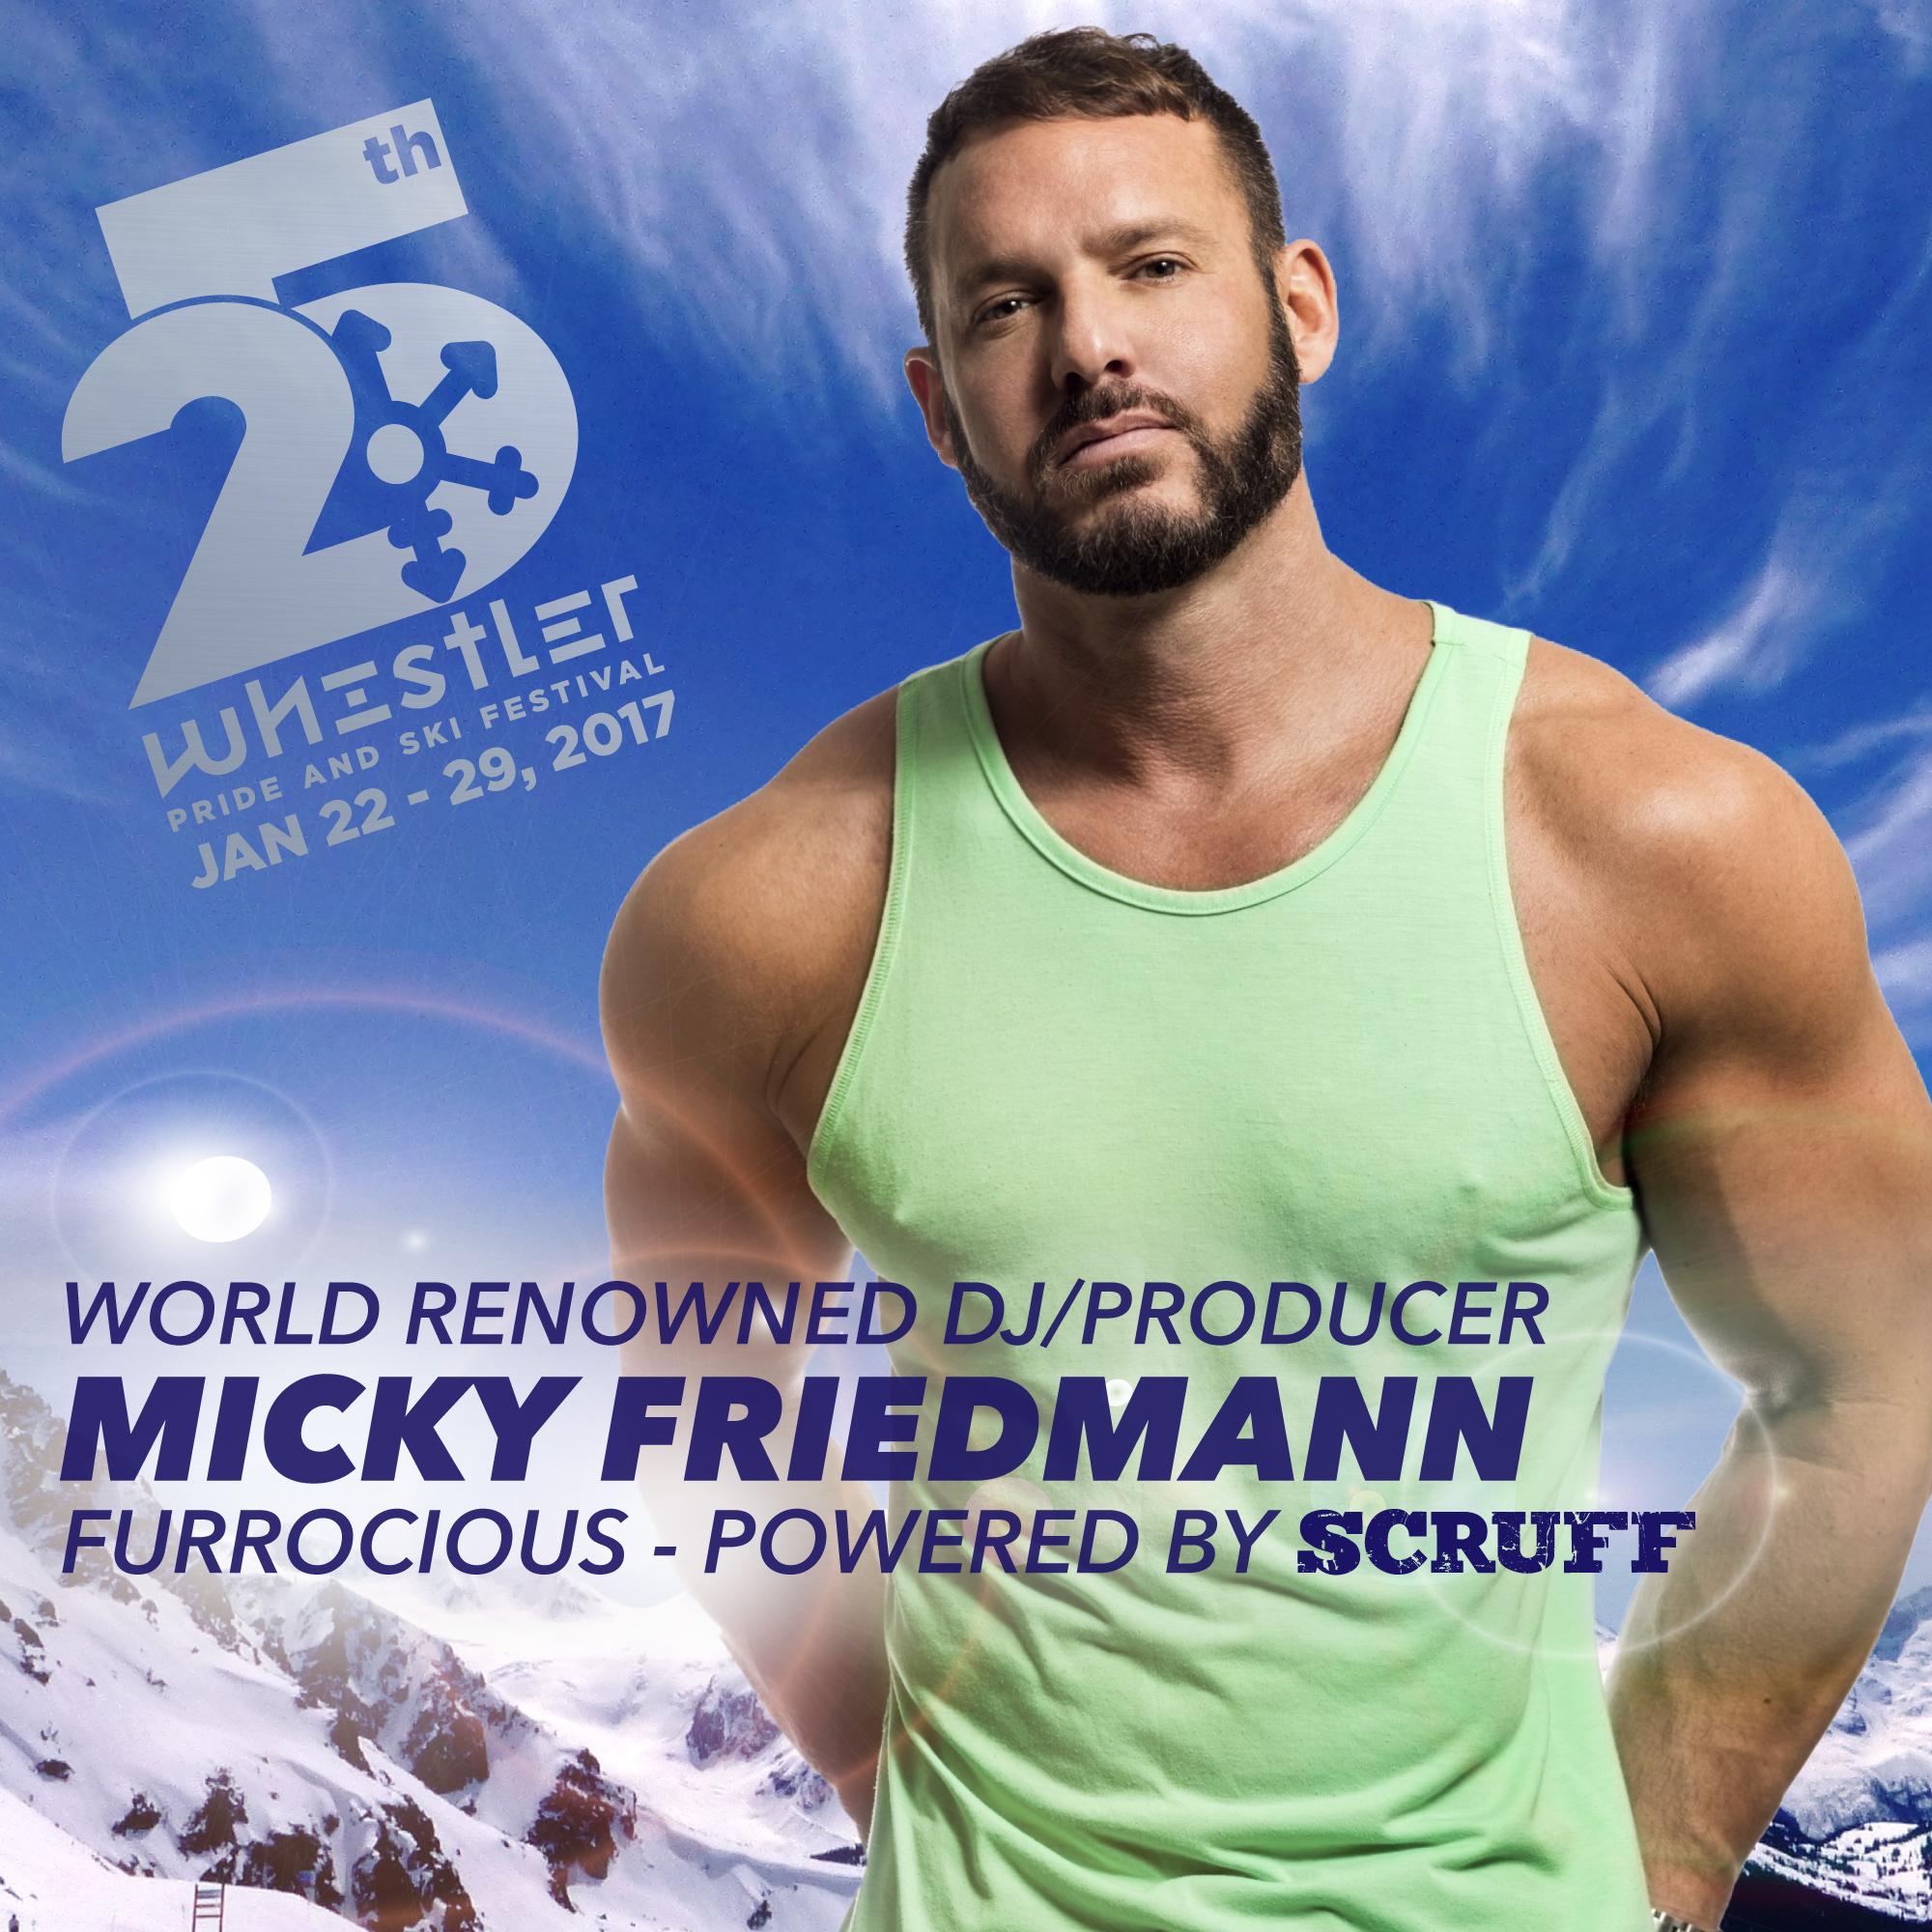 DJ Micky Friedmann at Furrocious Whistler Pride and Ski Festival